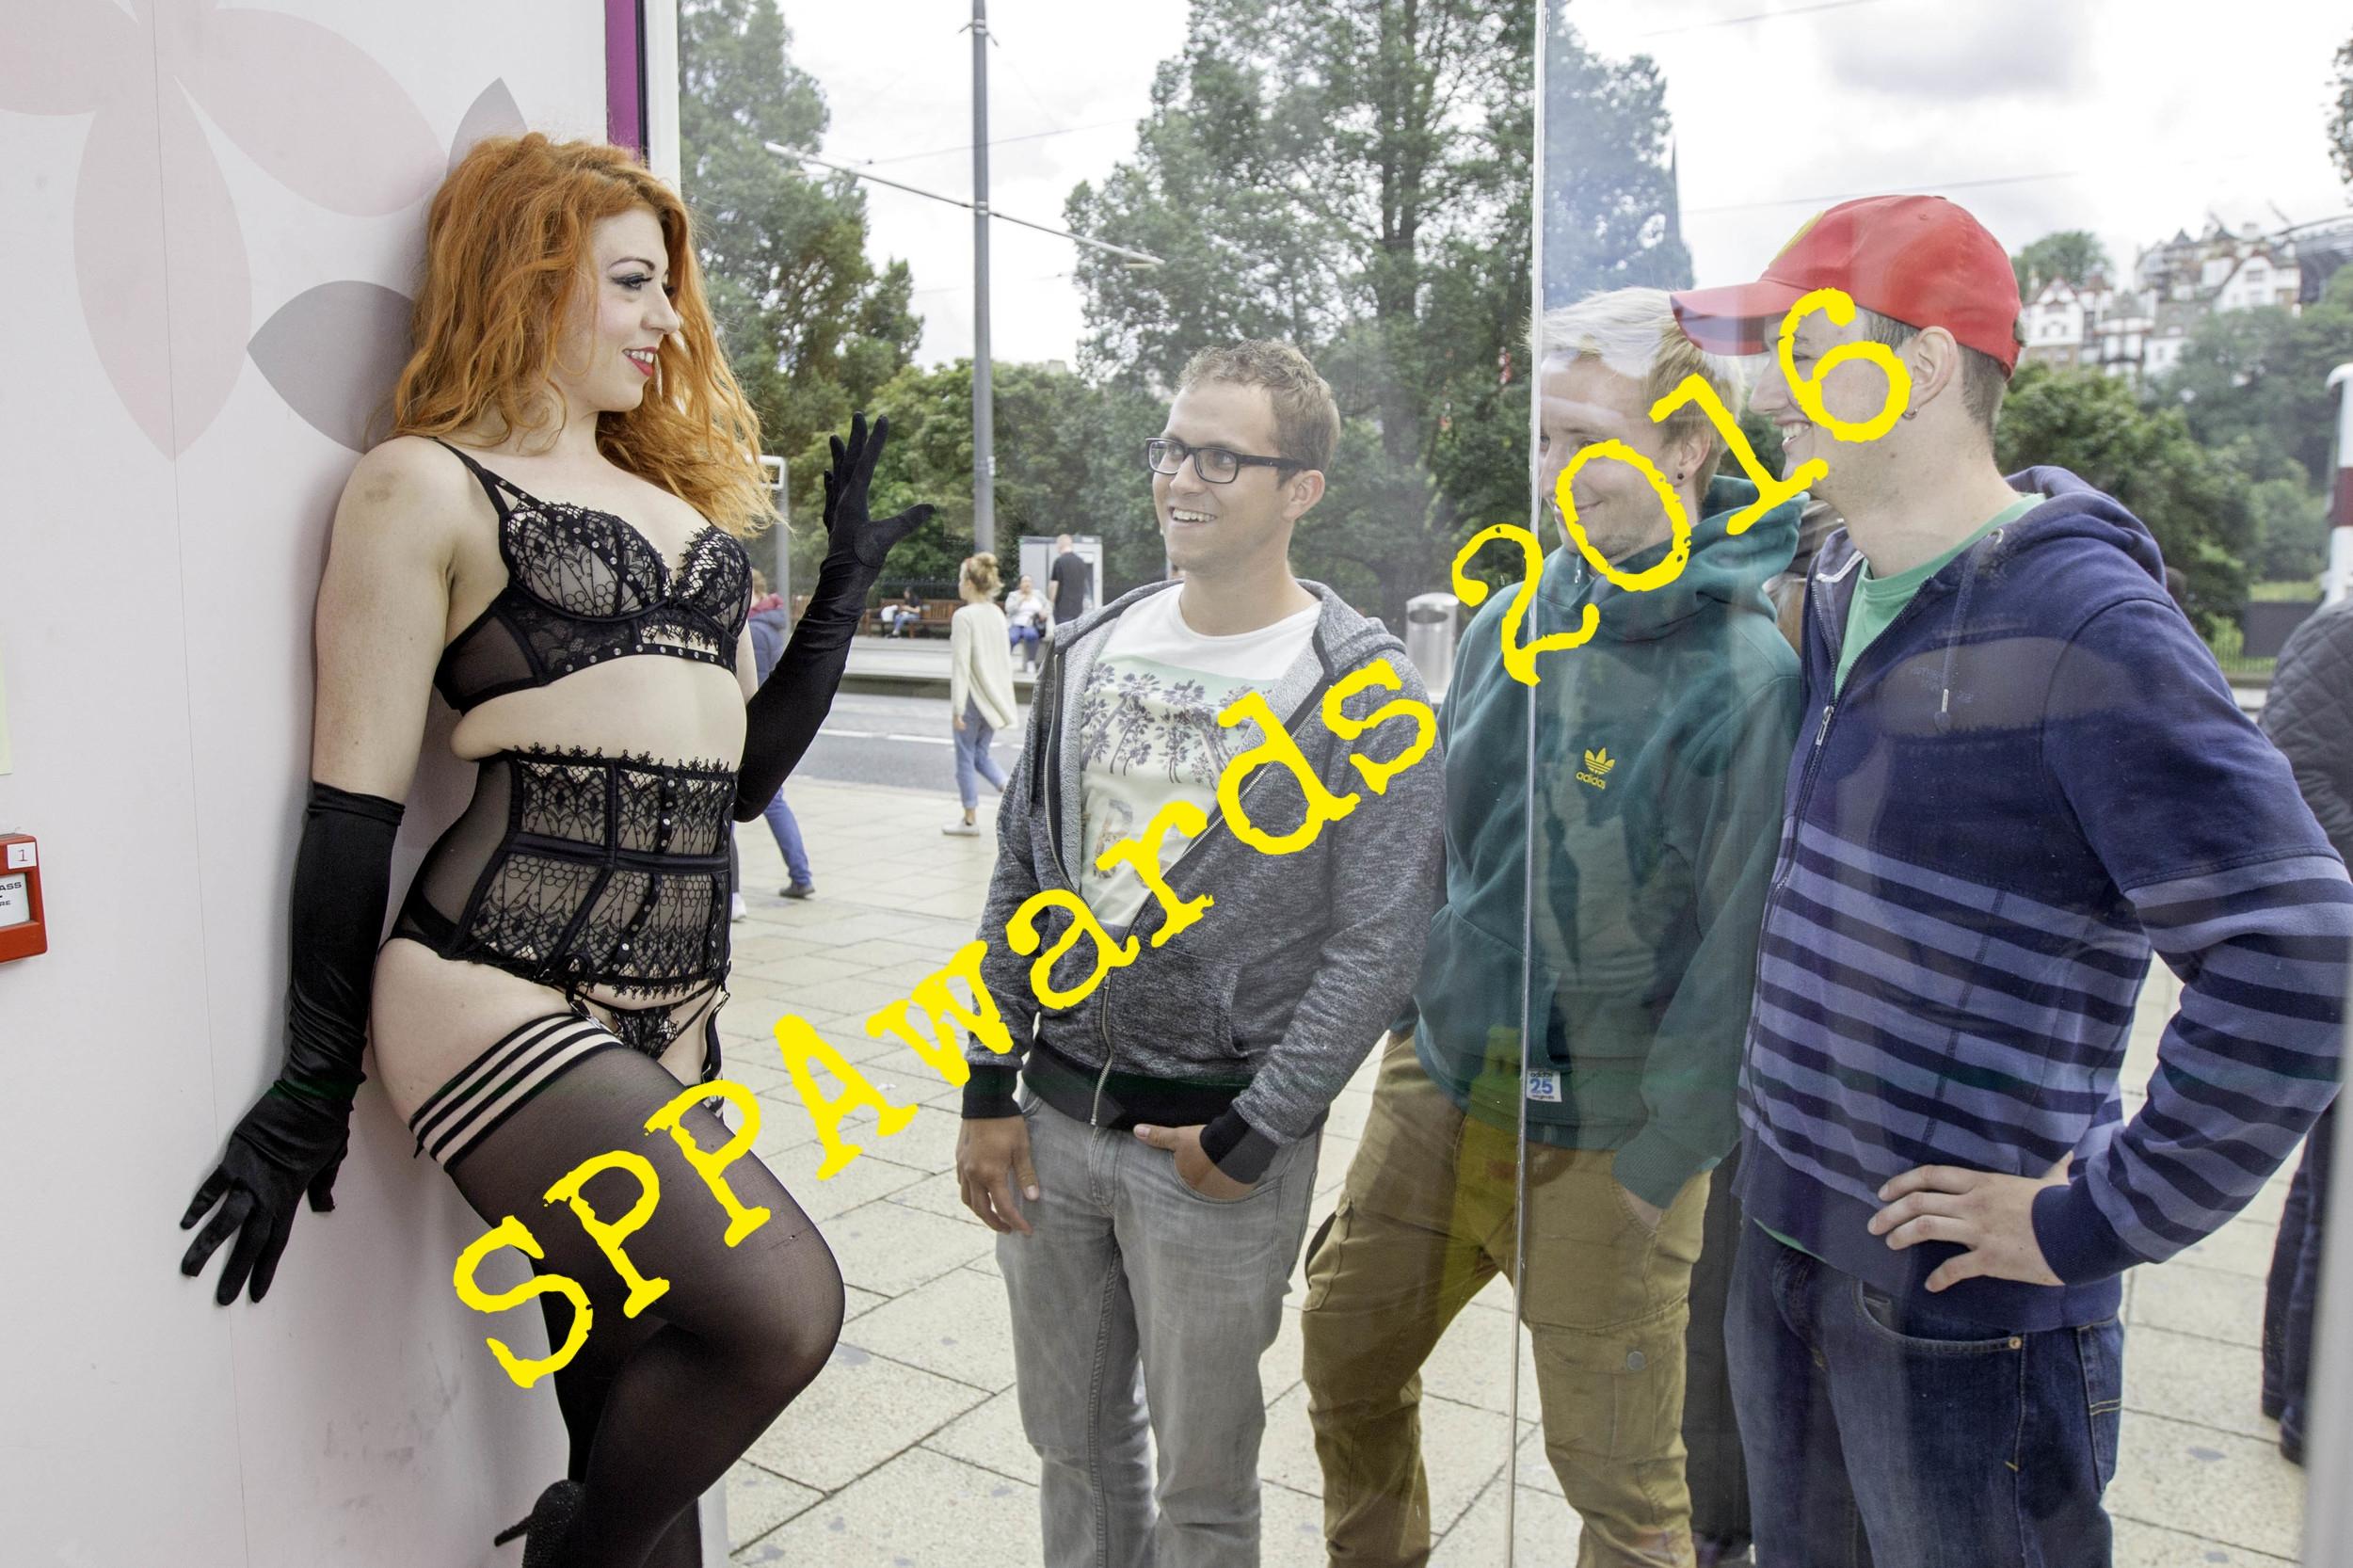 SPPA_MMcC_Arts and Entertainment_002_20150824_.JPG